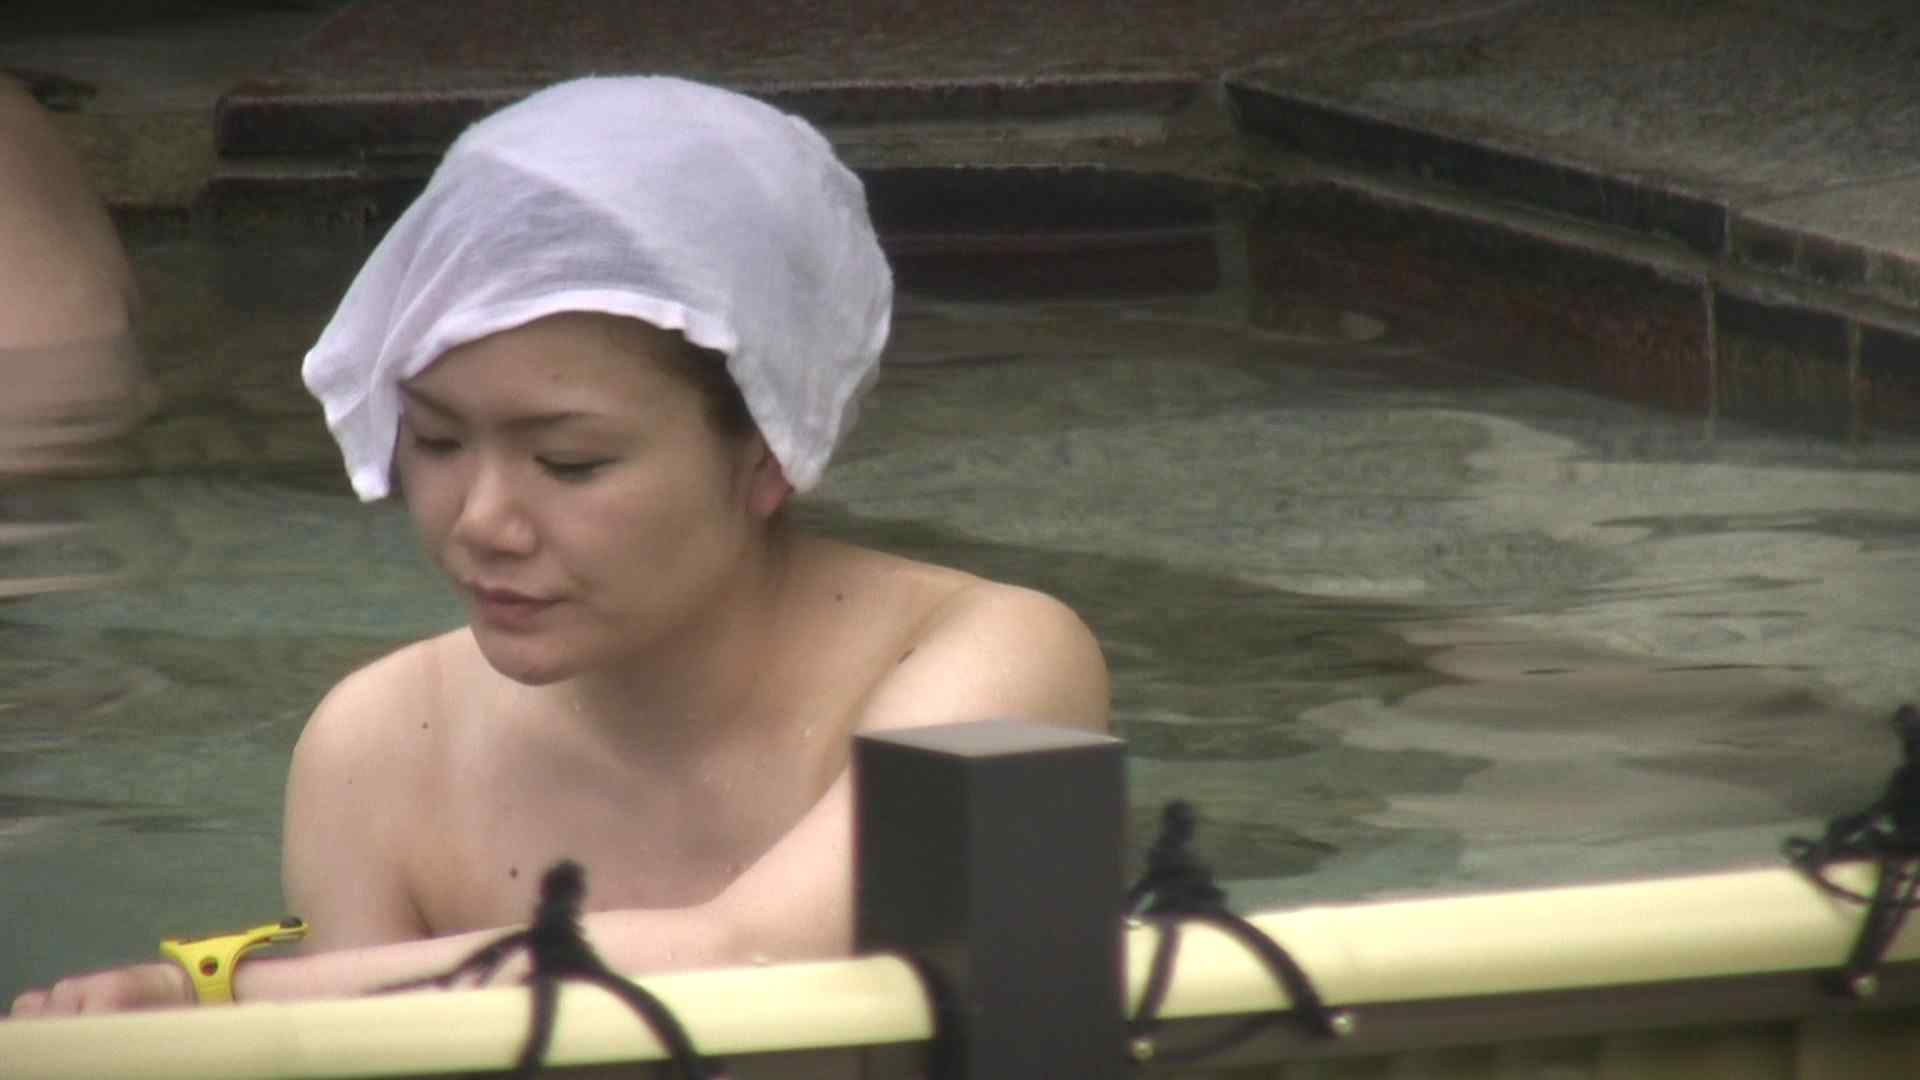 Aquaな露天風呂Vol.12【VIP】 HなOL | 盗撮  83pic 41